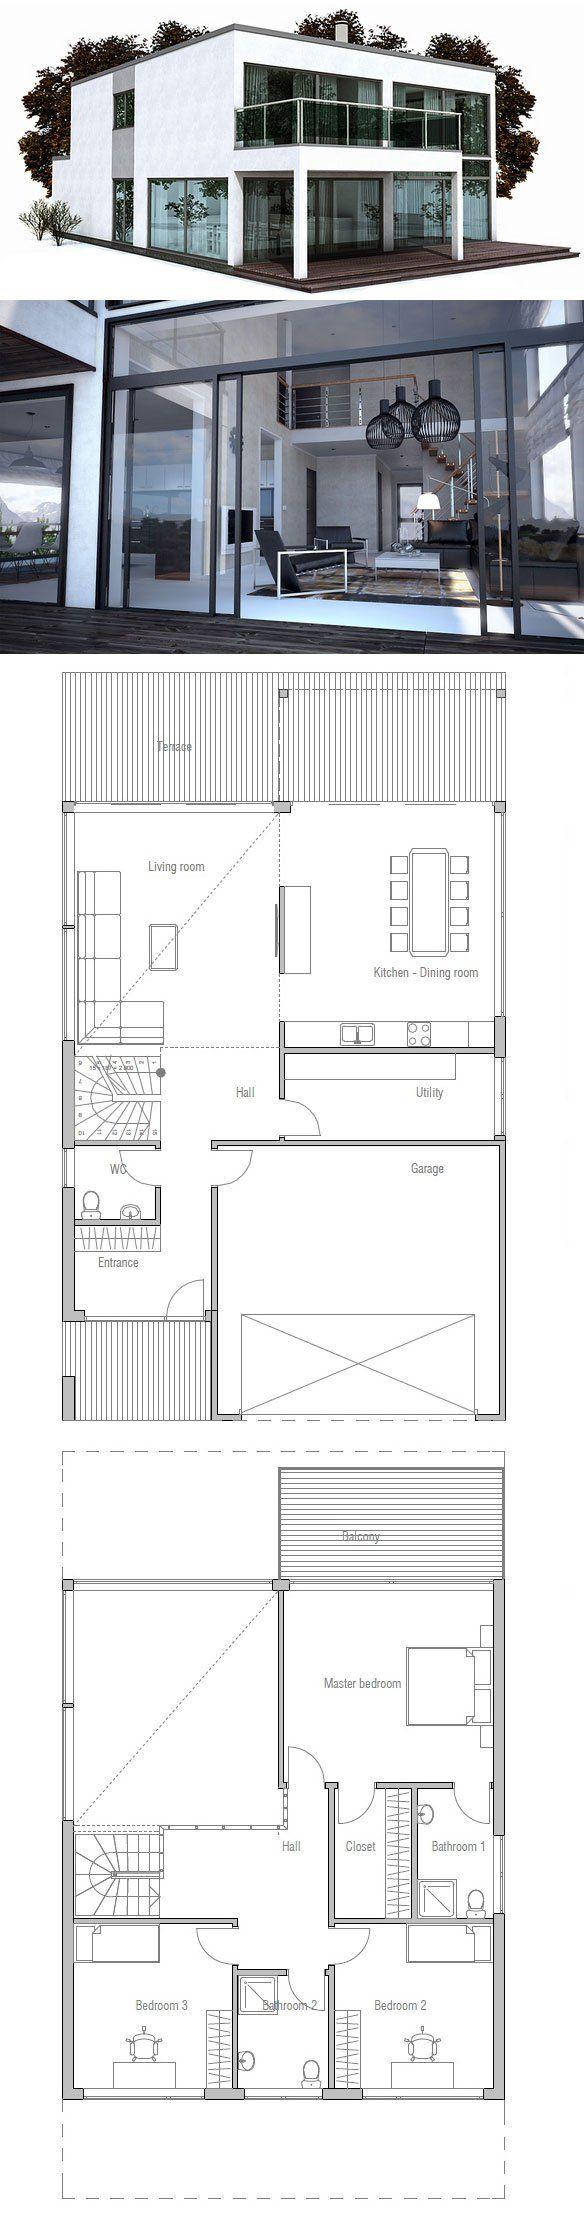 25  best ideas about Large Kitchen Plans on Pinterest   Large kitchen diy  Kitchen  layout plans and Kitchen layouts. 25  best ideas about Large Kitchen Plans on Pinterest   Large